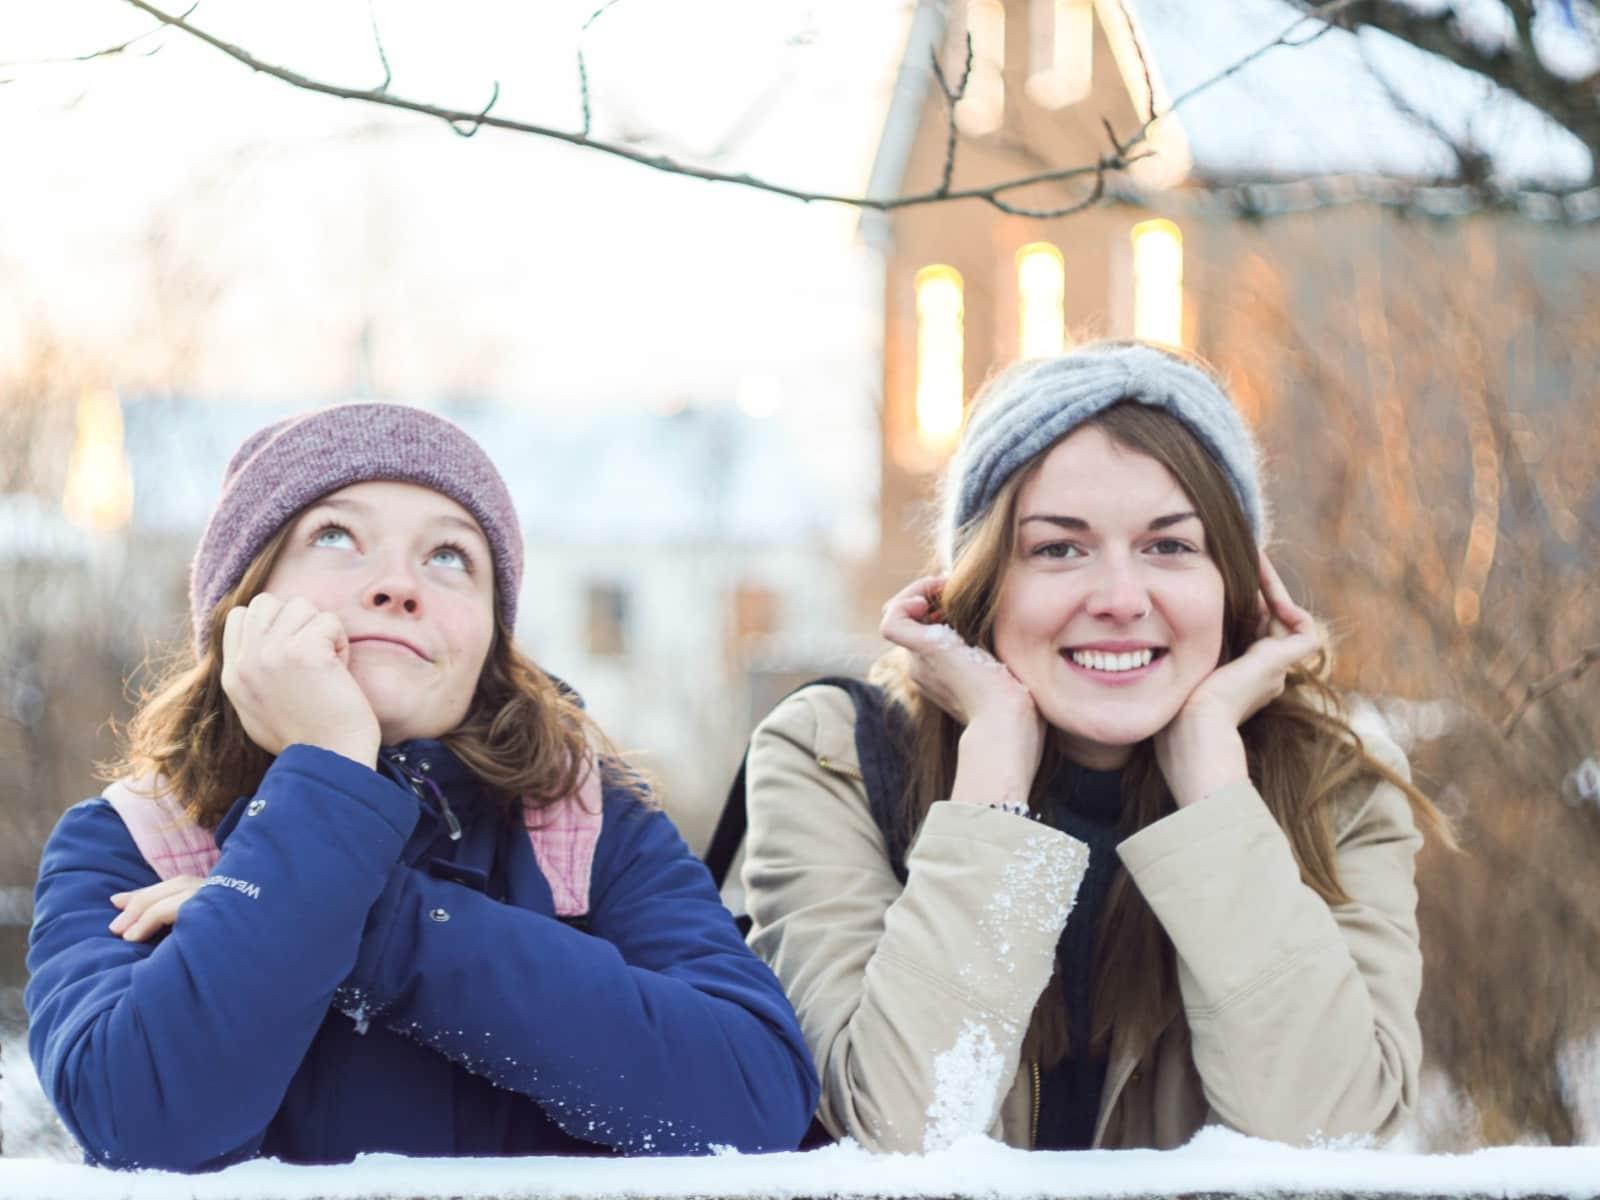 Maja & Anna from Reykjavík, Iceland